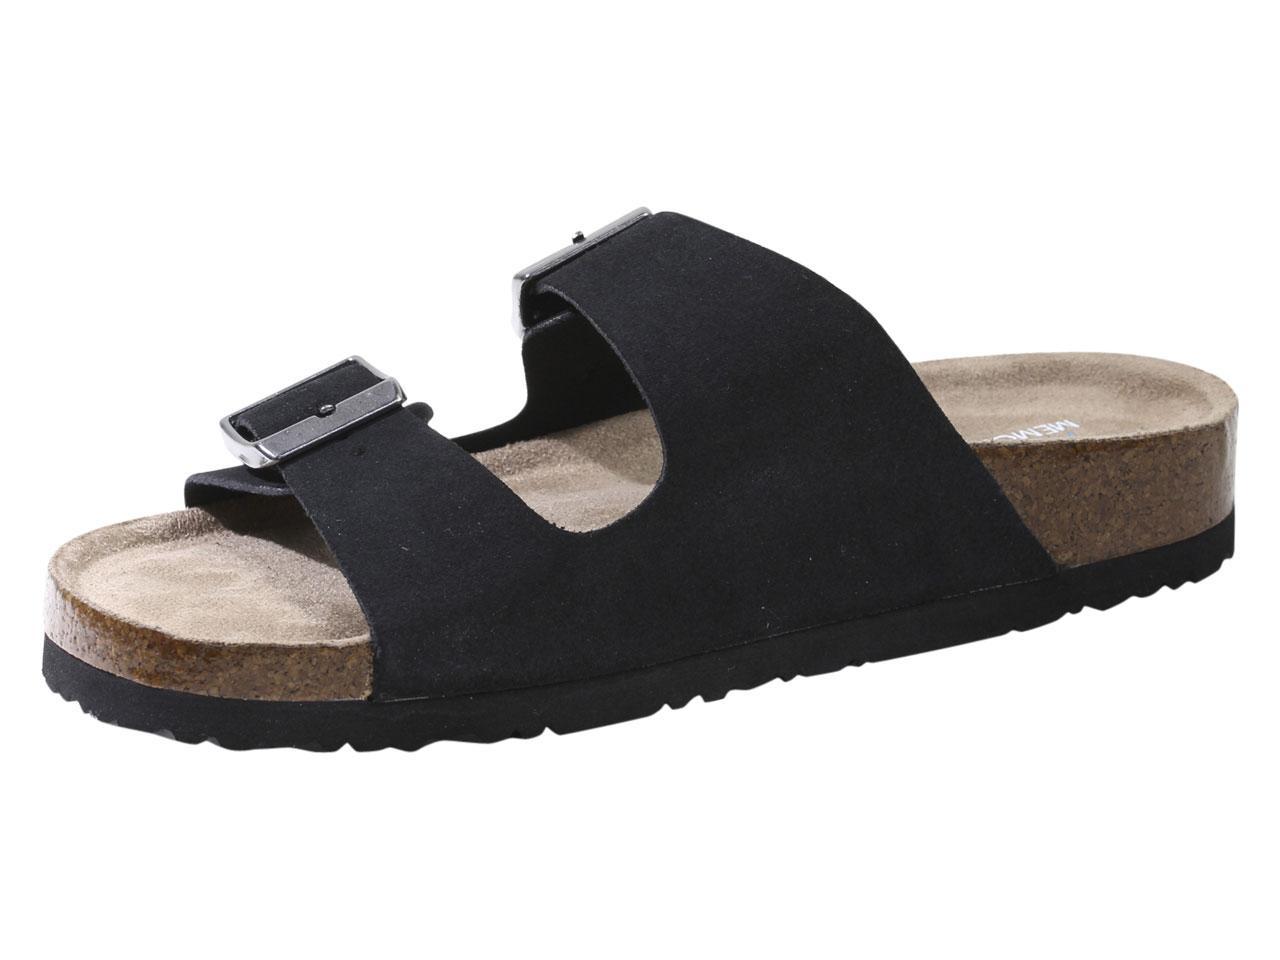 skechers sandals with memory foam